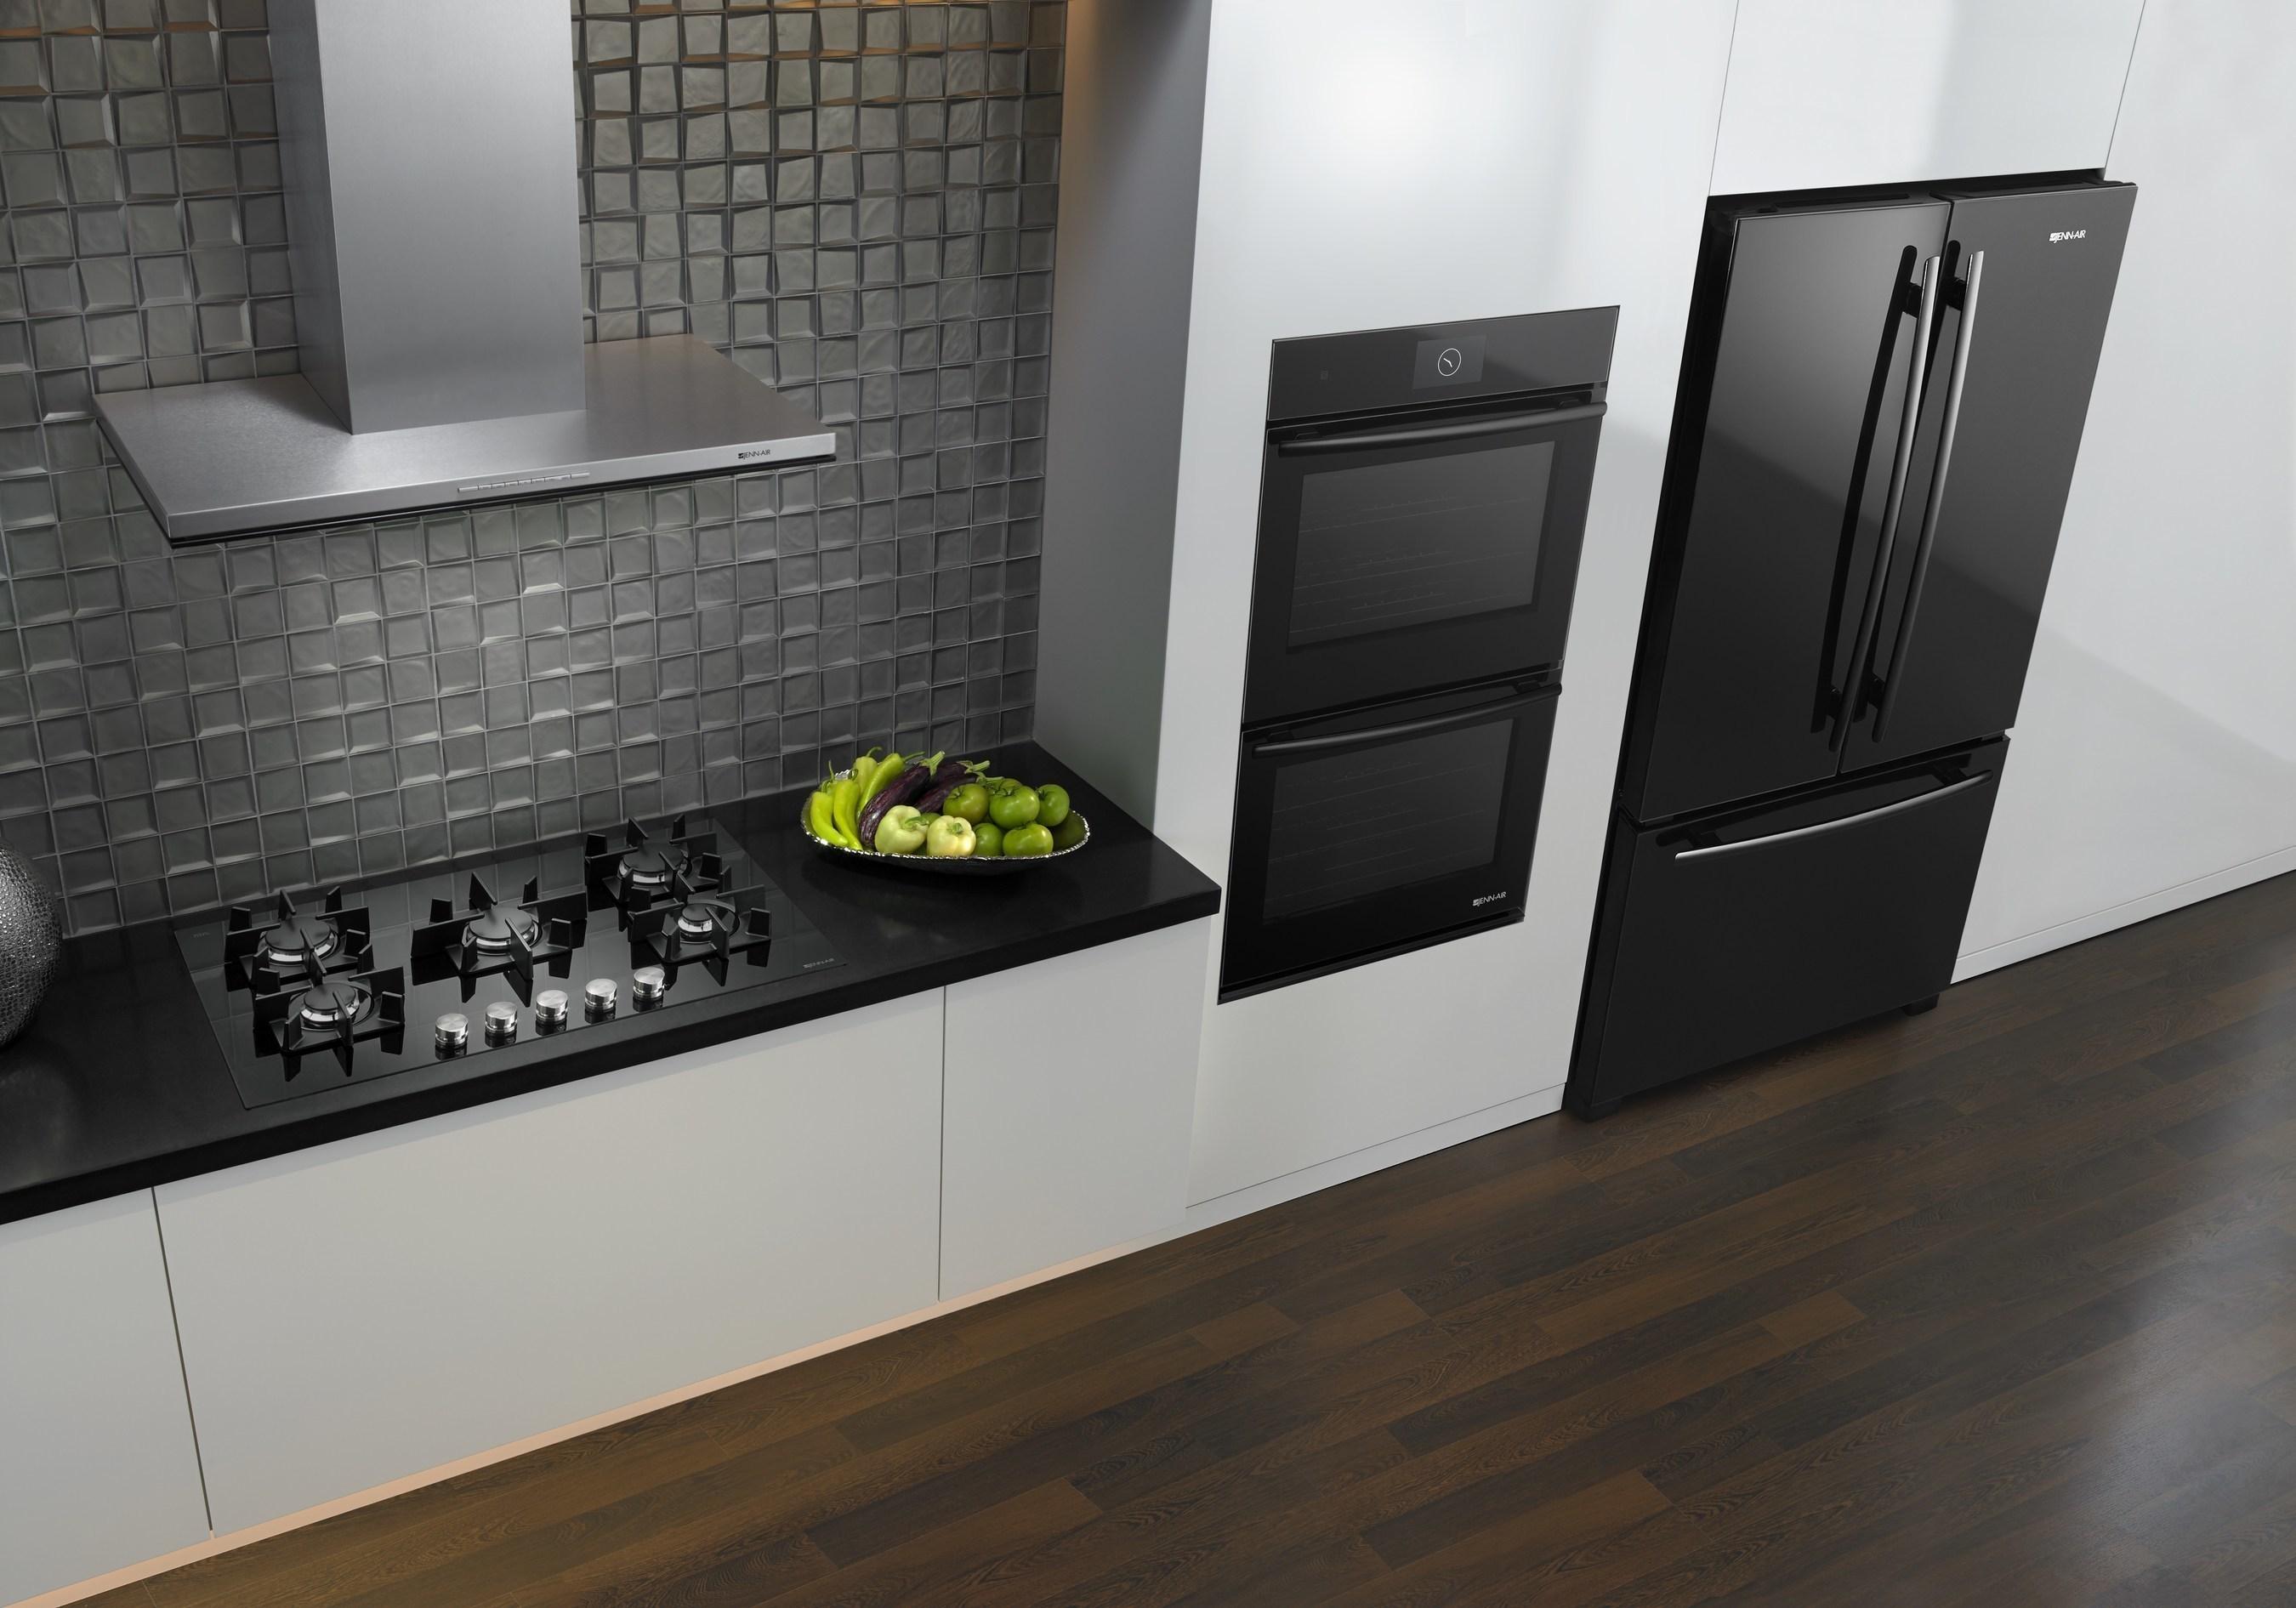 Jenn Air Microwave >> Jenn-Air® Black Floating Glass Appliances Offer Sleek ...